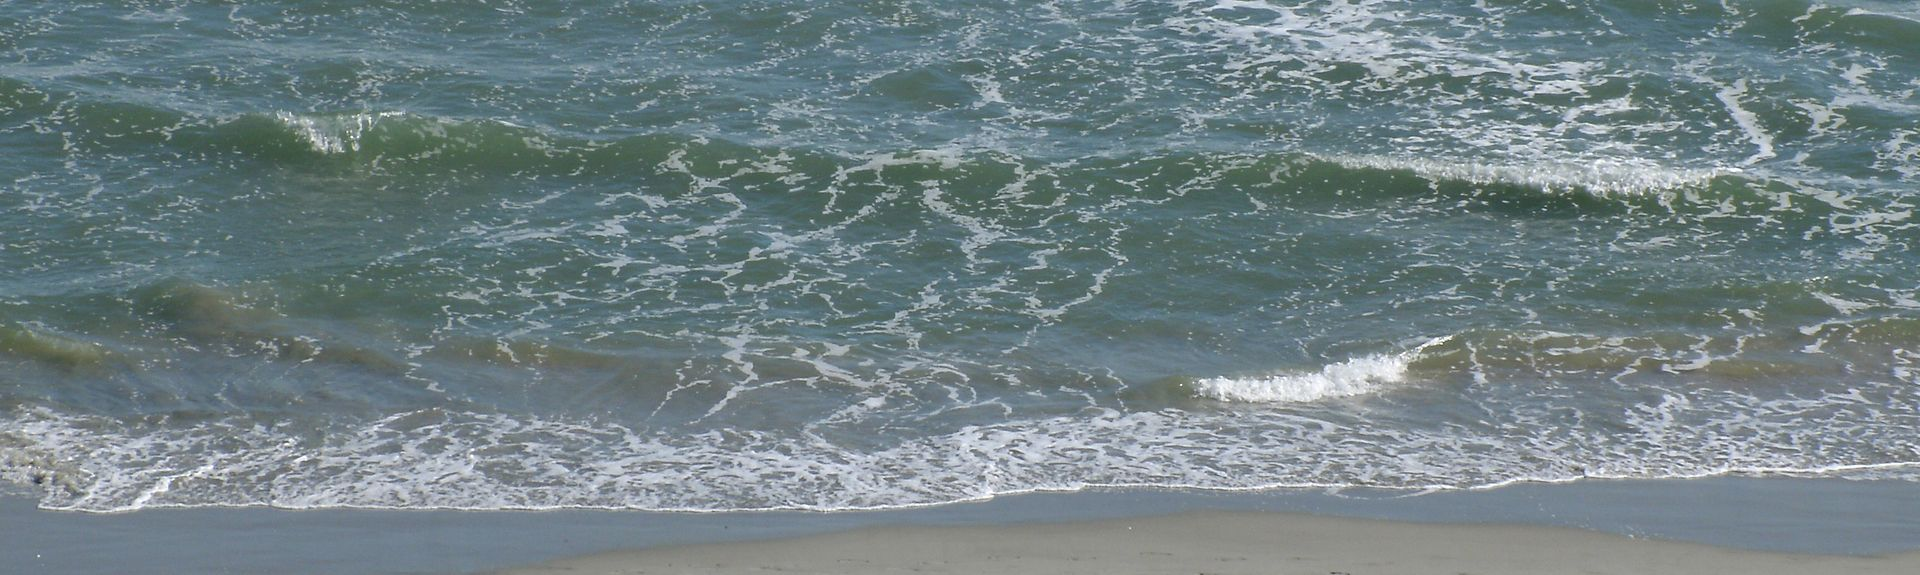 South Hampton, Myrtle Beach, SC, USA